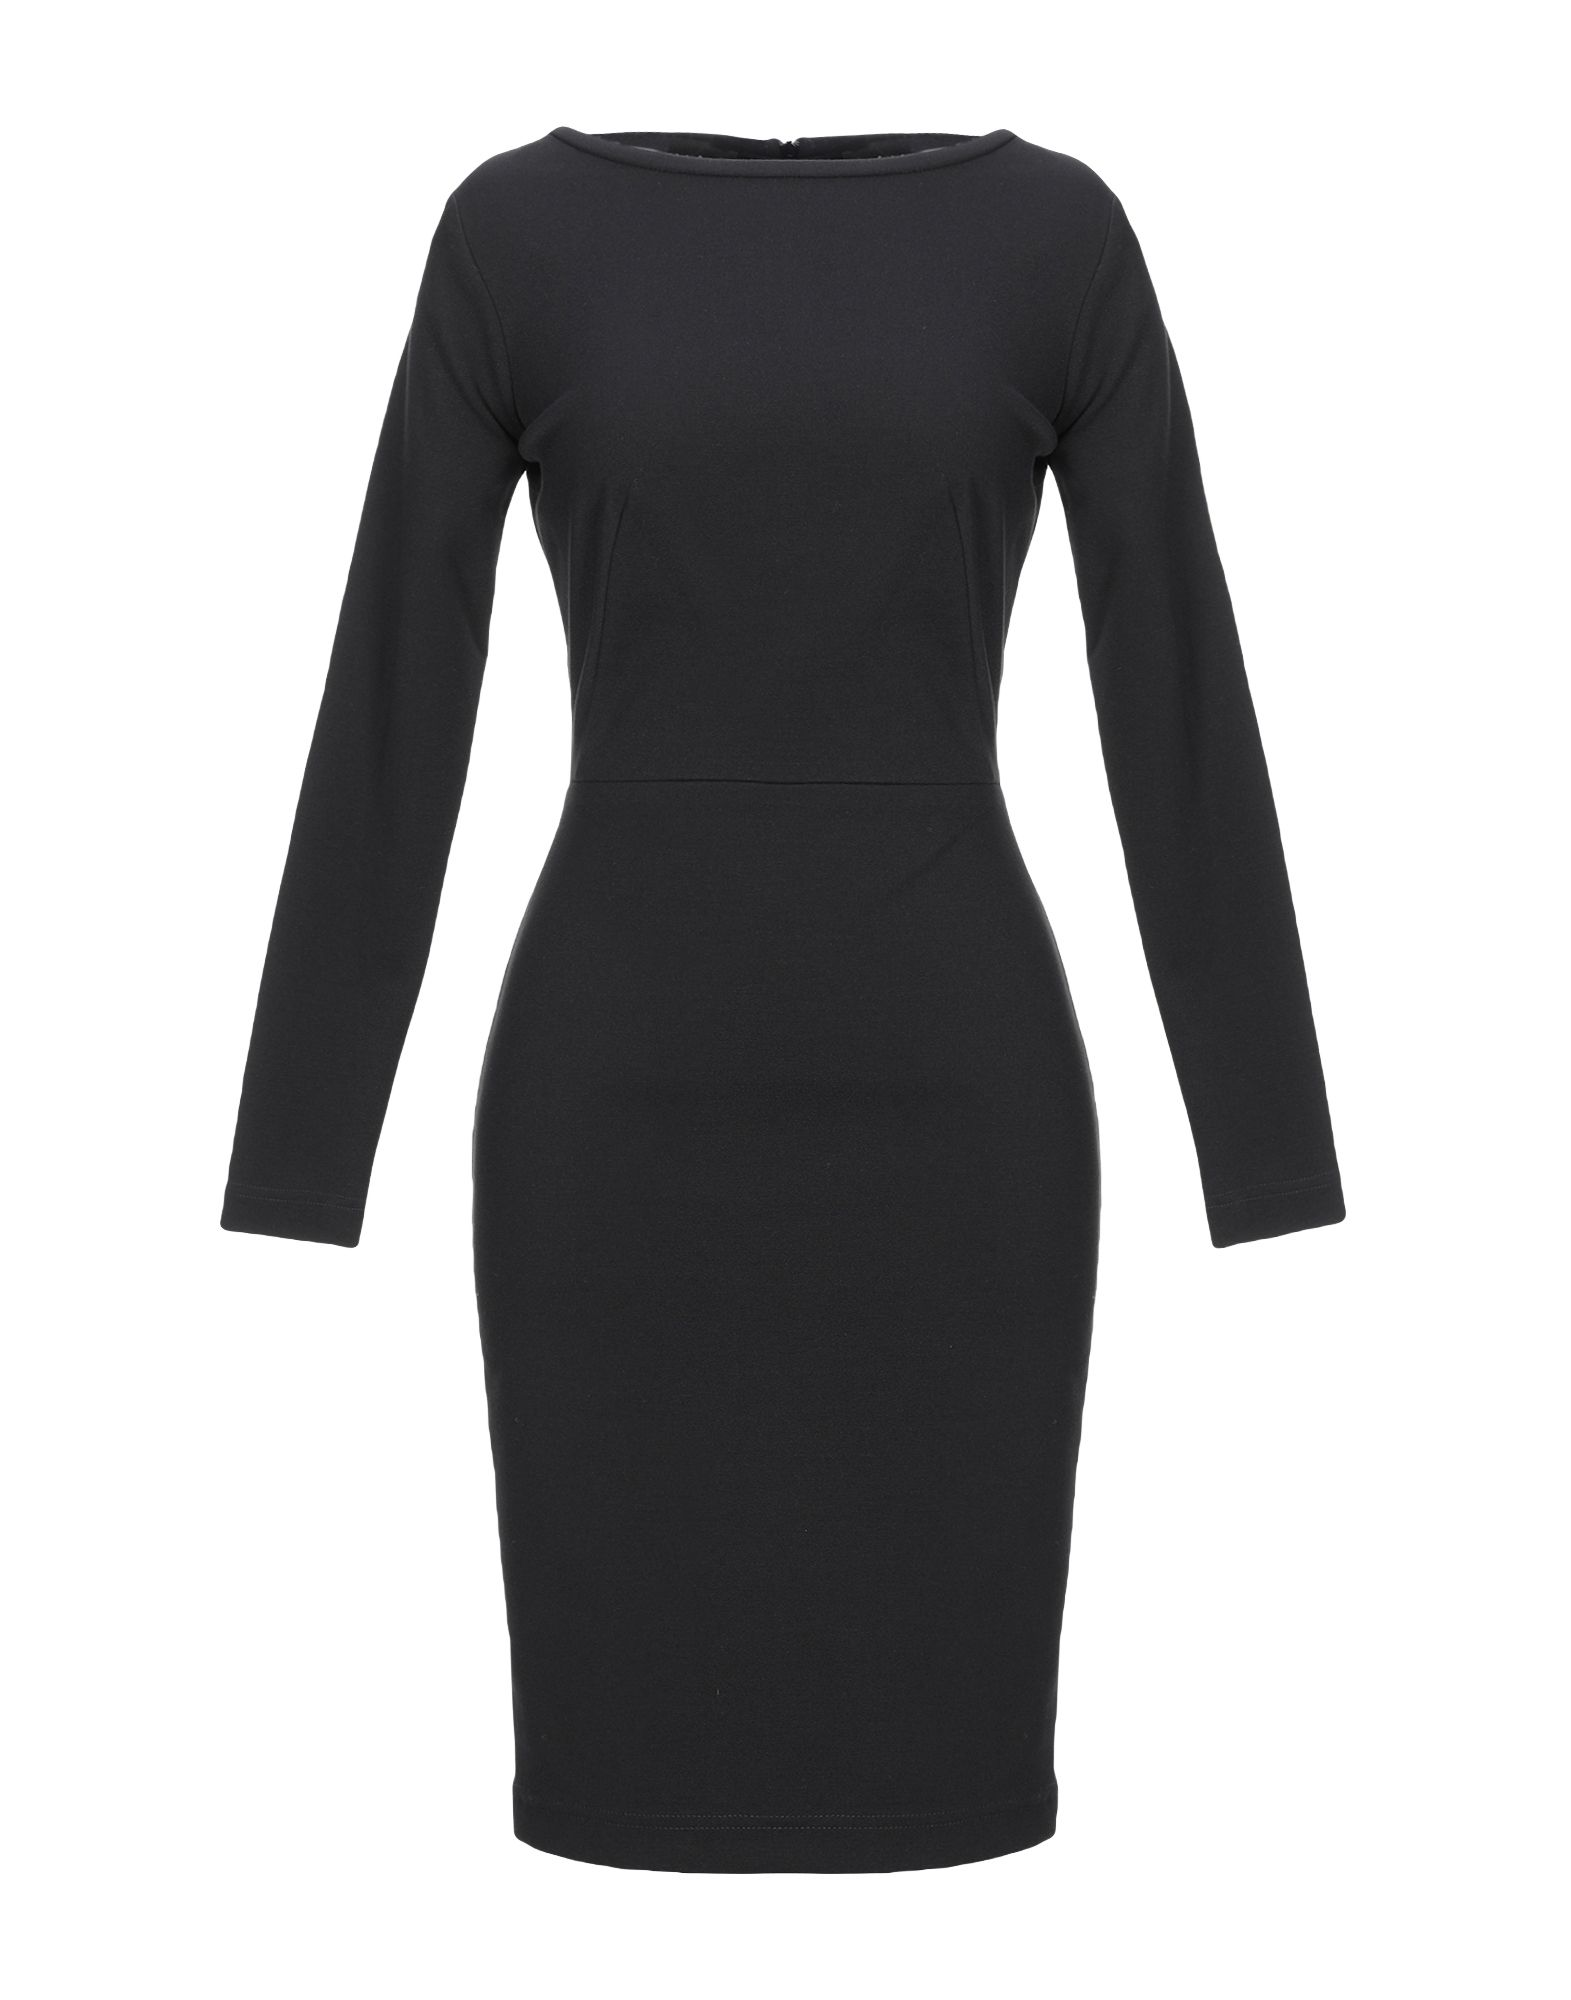 PAUL SMITH BLACK LABEL Короткое платье цена и фото